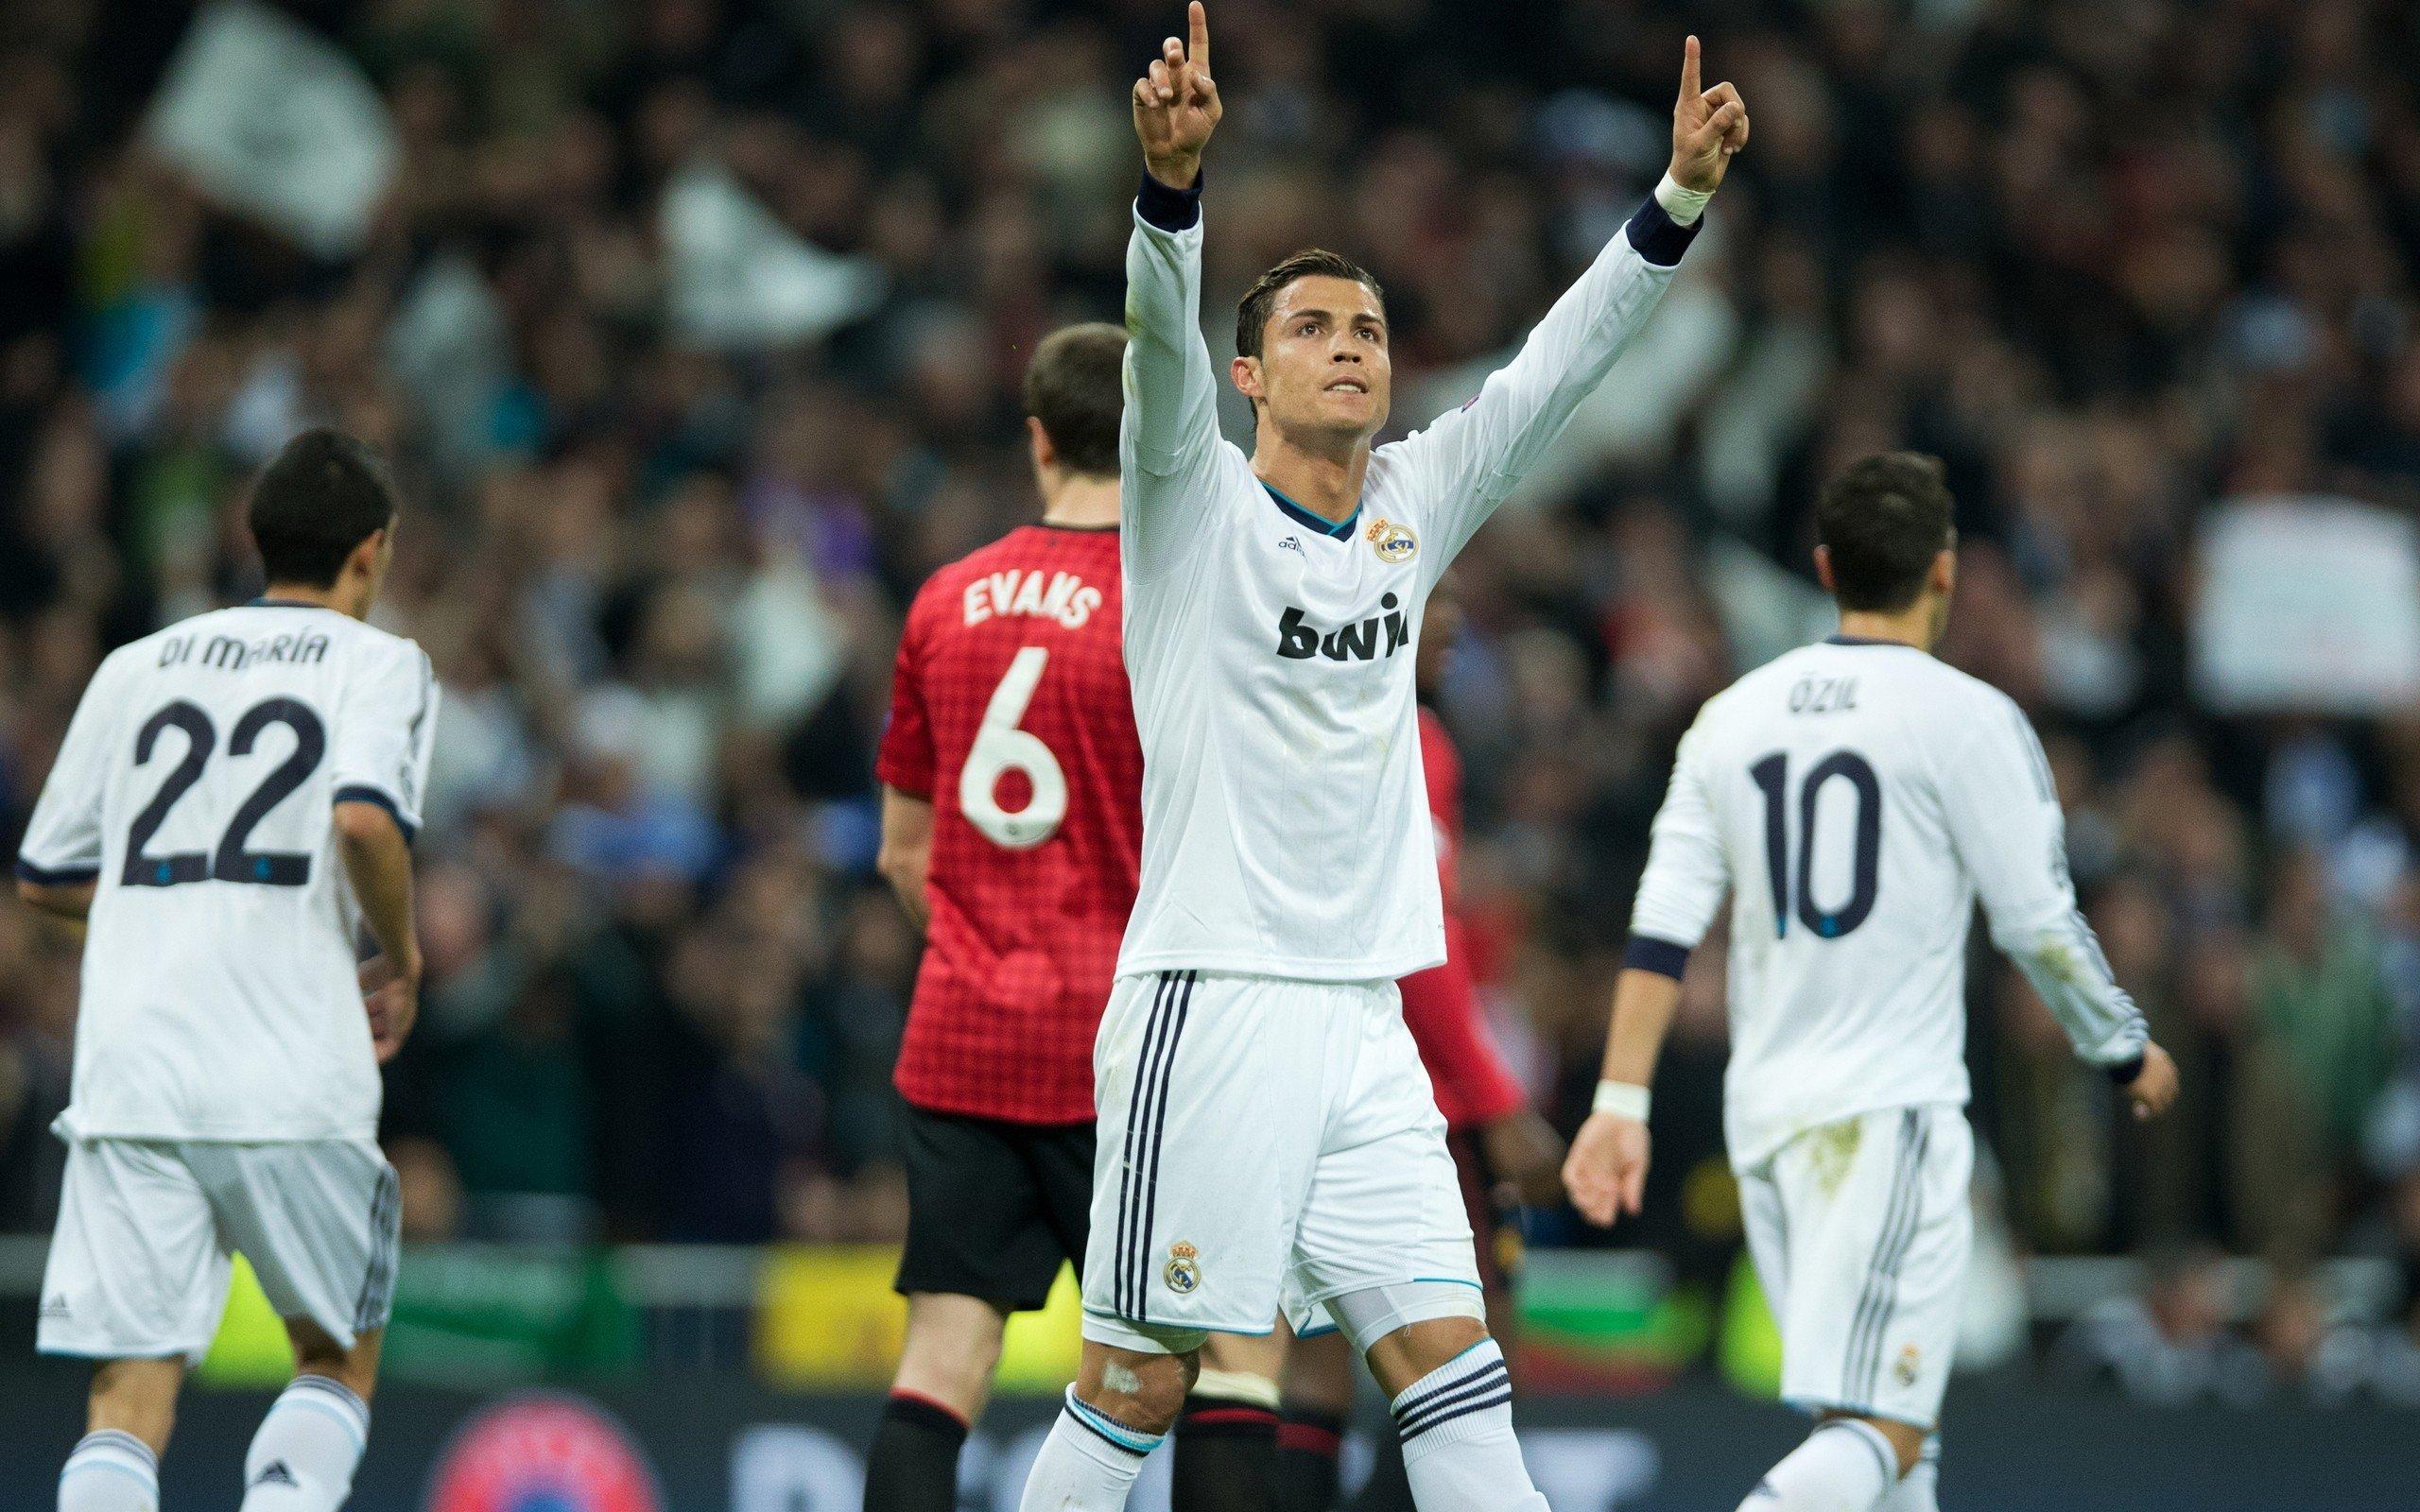 Sports, Cristiano Ronaldo, Ángel Di María, Mesut Ozil